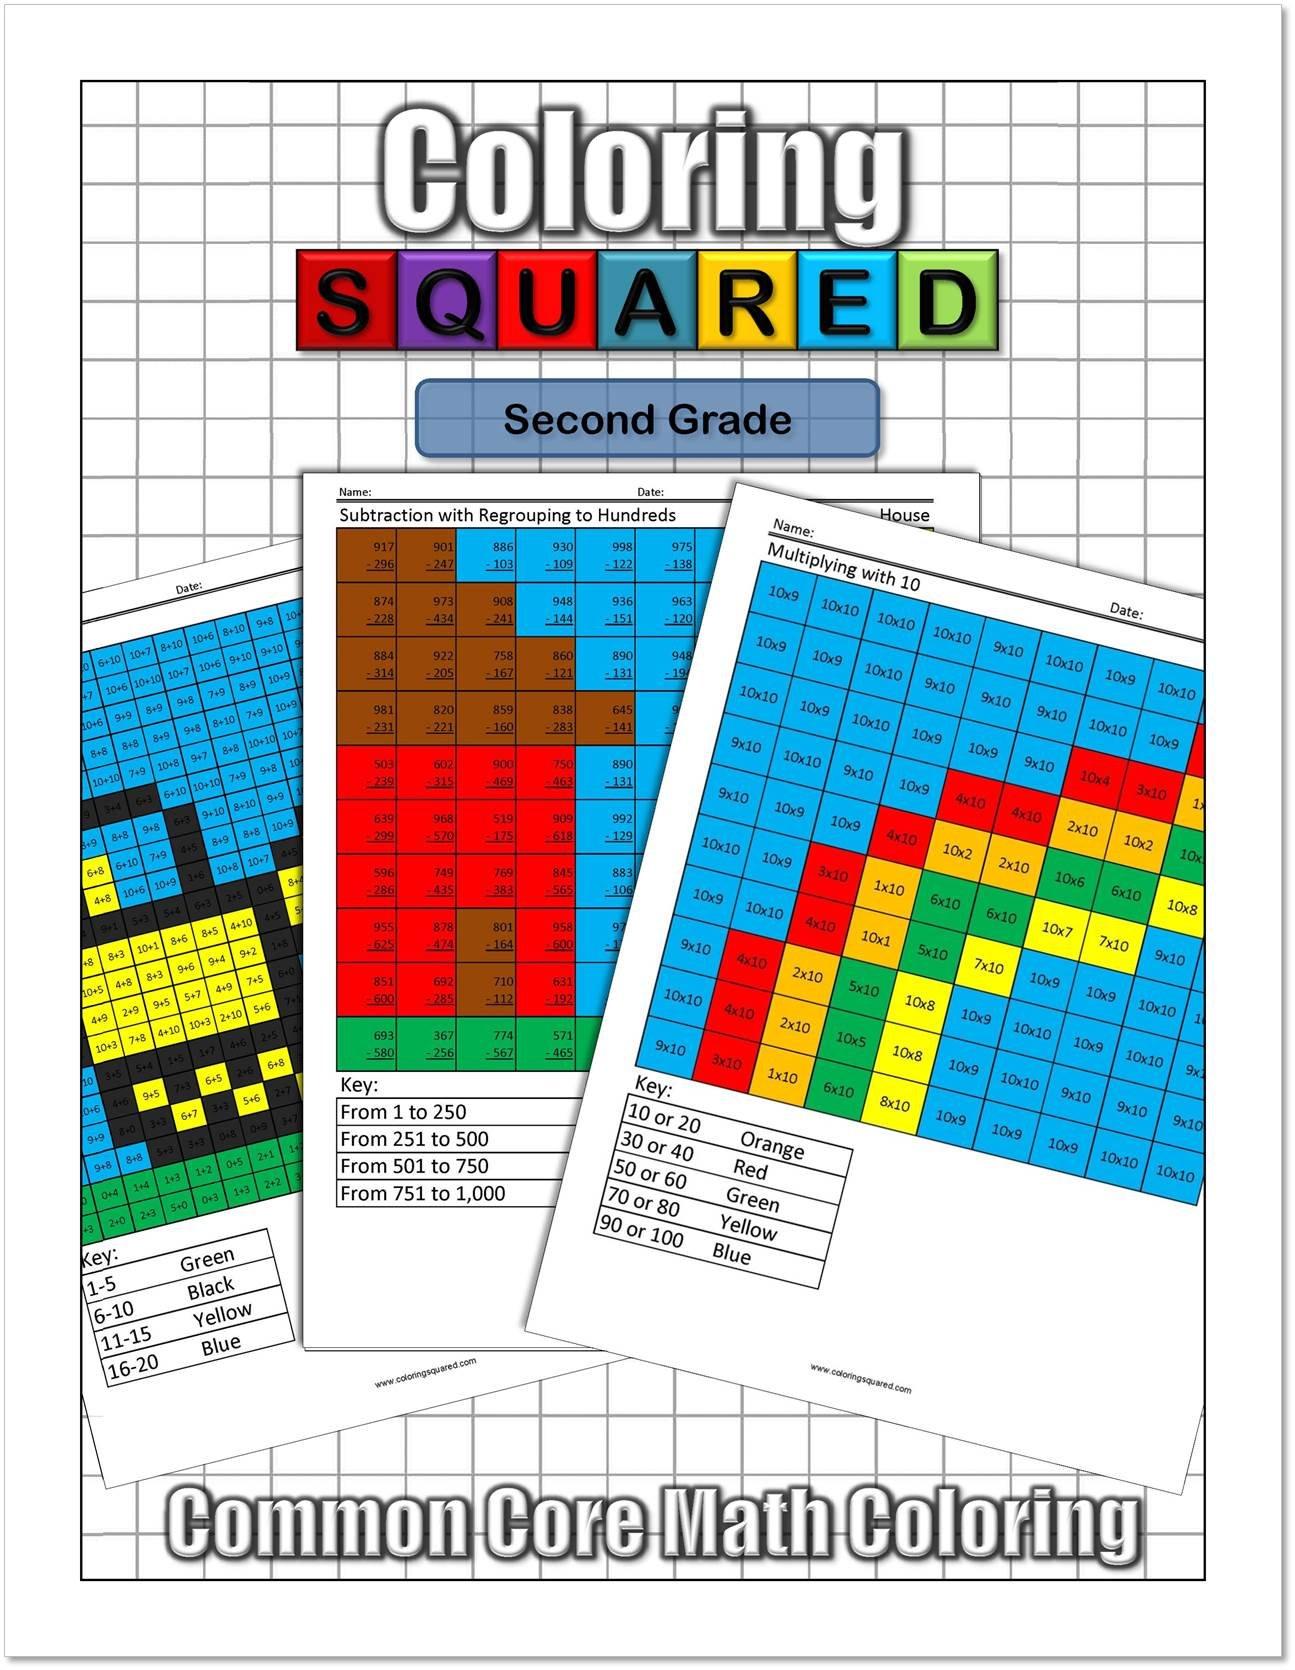 Coloring Squared: Second Grade: Cameron Krantzman: 9781939668110 ...